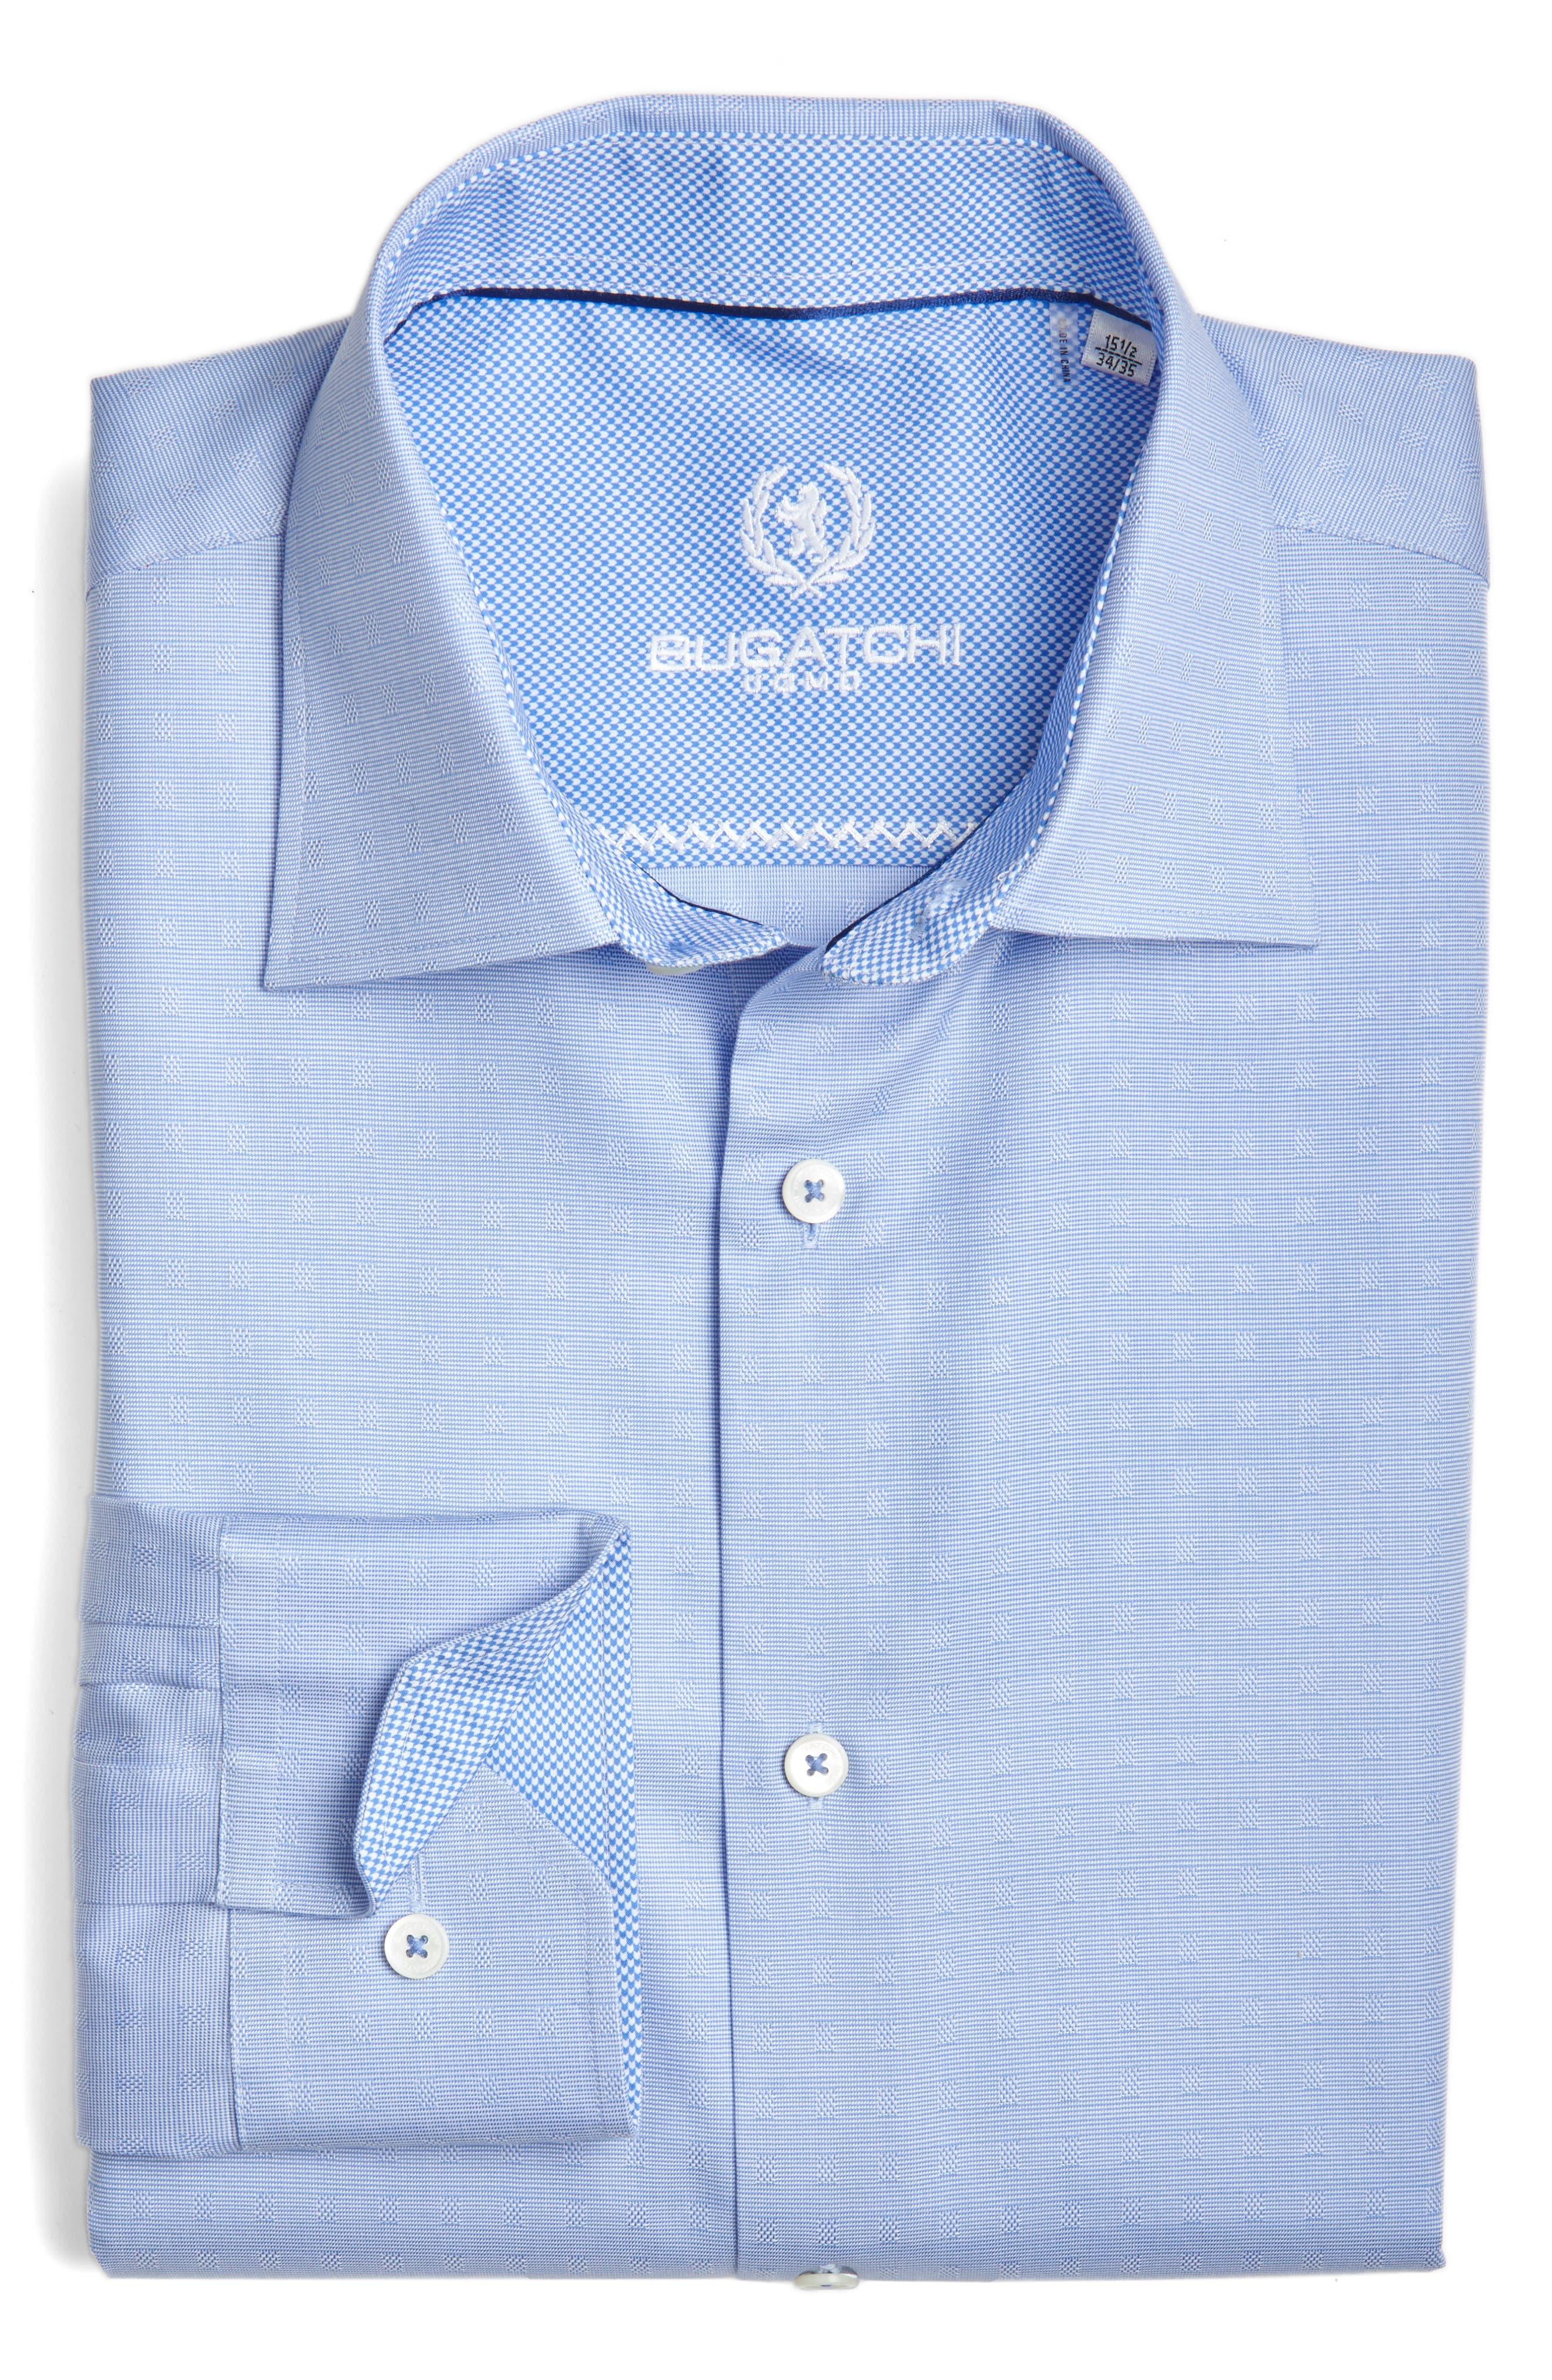 Main Image - Bugatchi Trim Fit Solid Dress Shirt